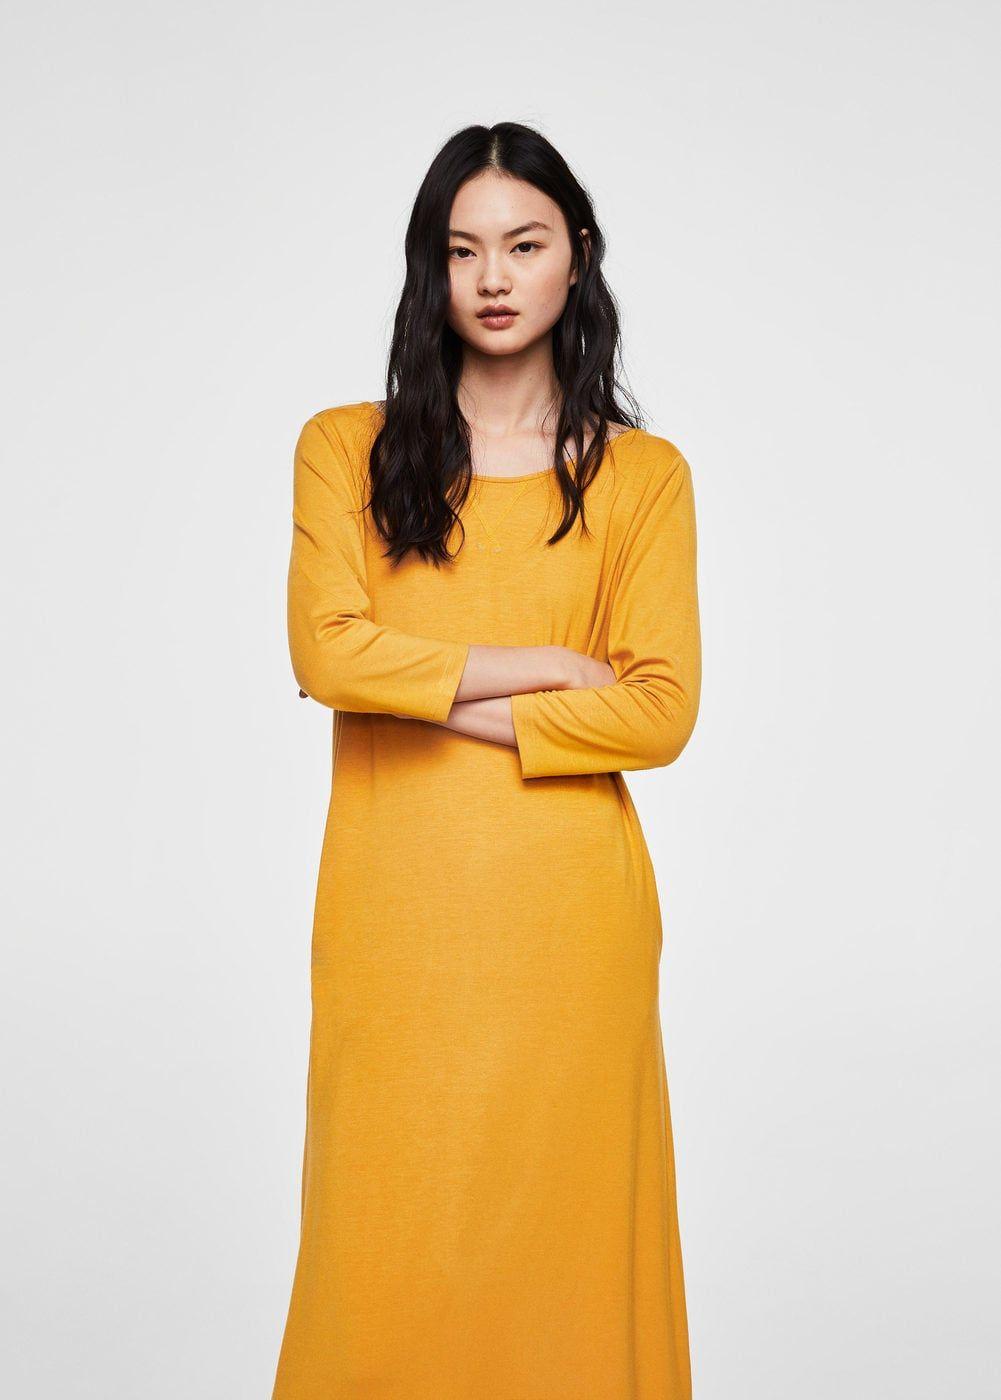 Basic Penye Elbise Kadin Mango Turkiye The Dress Elbise Moda Stilleri